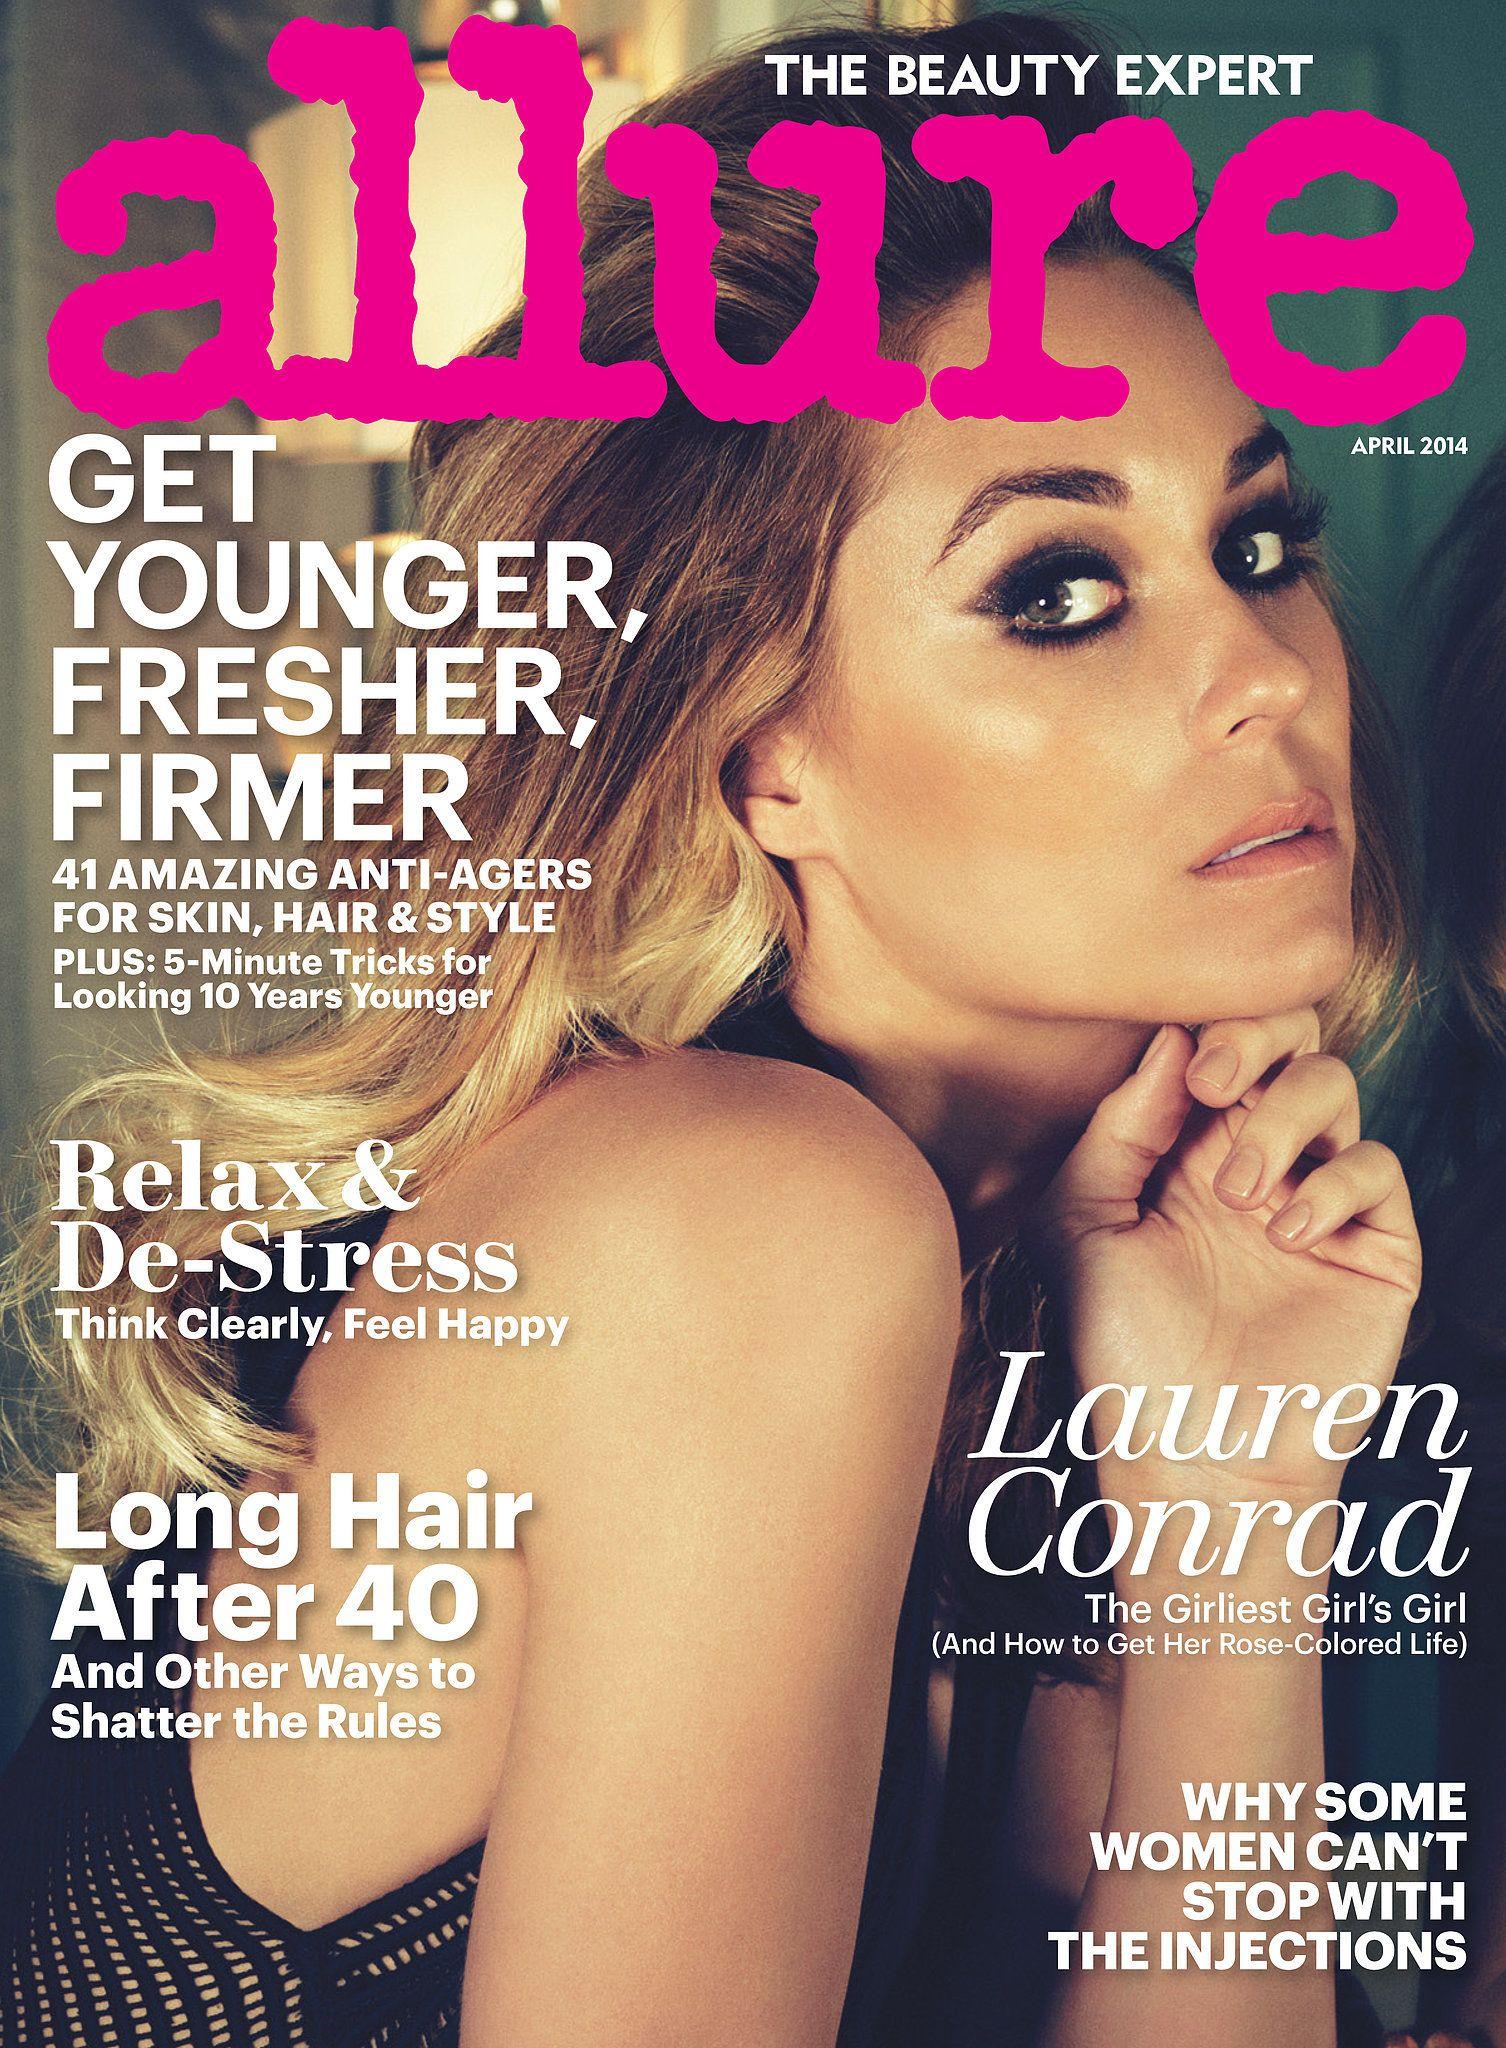 Allure April 2014 Covergirl, Lauren conrad, Beauty advice